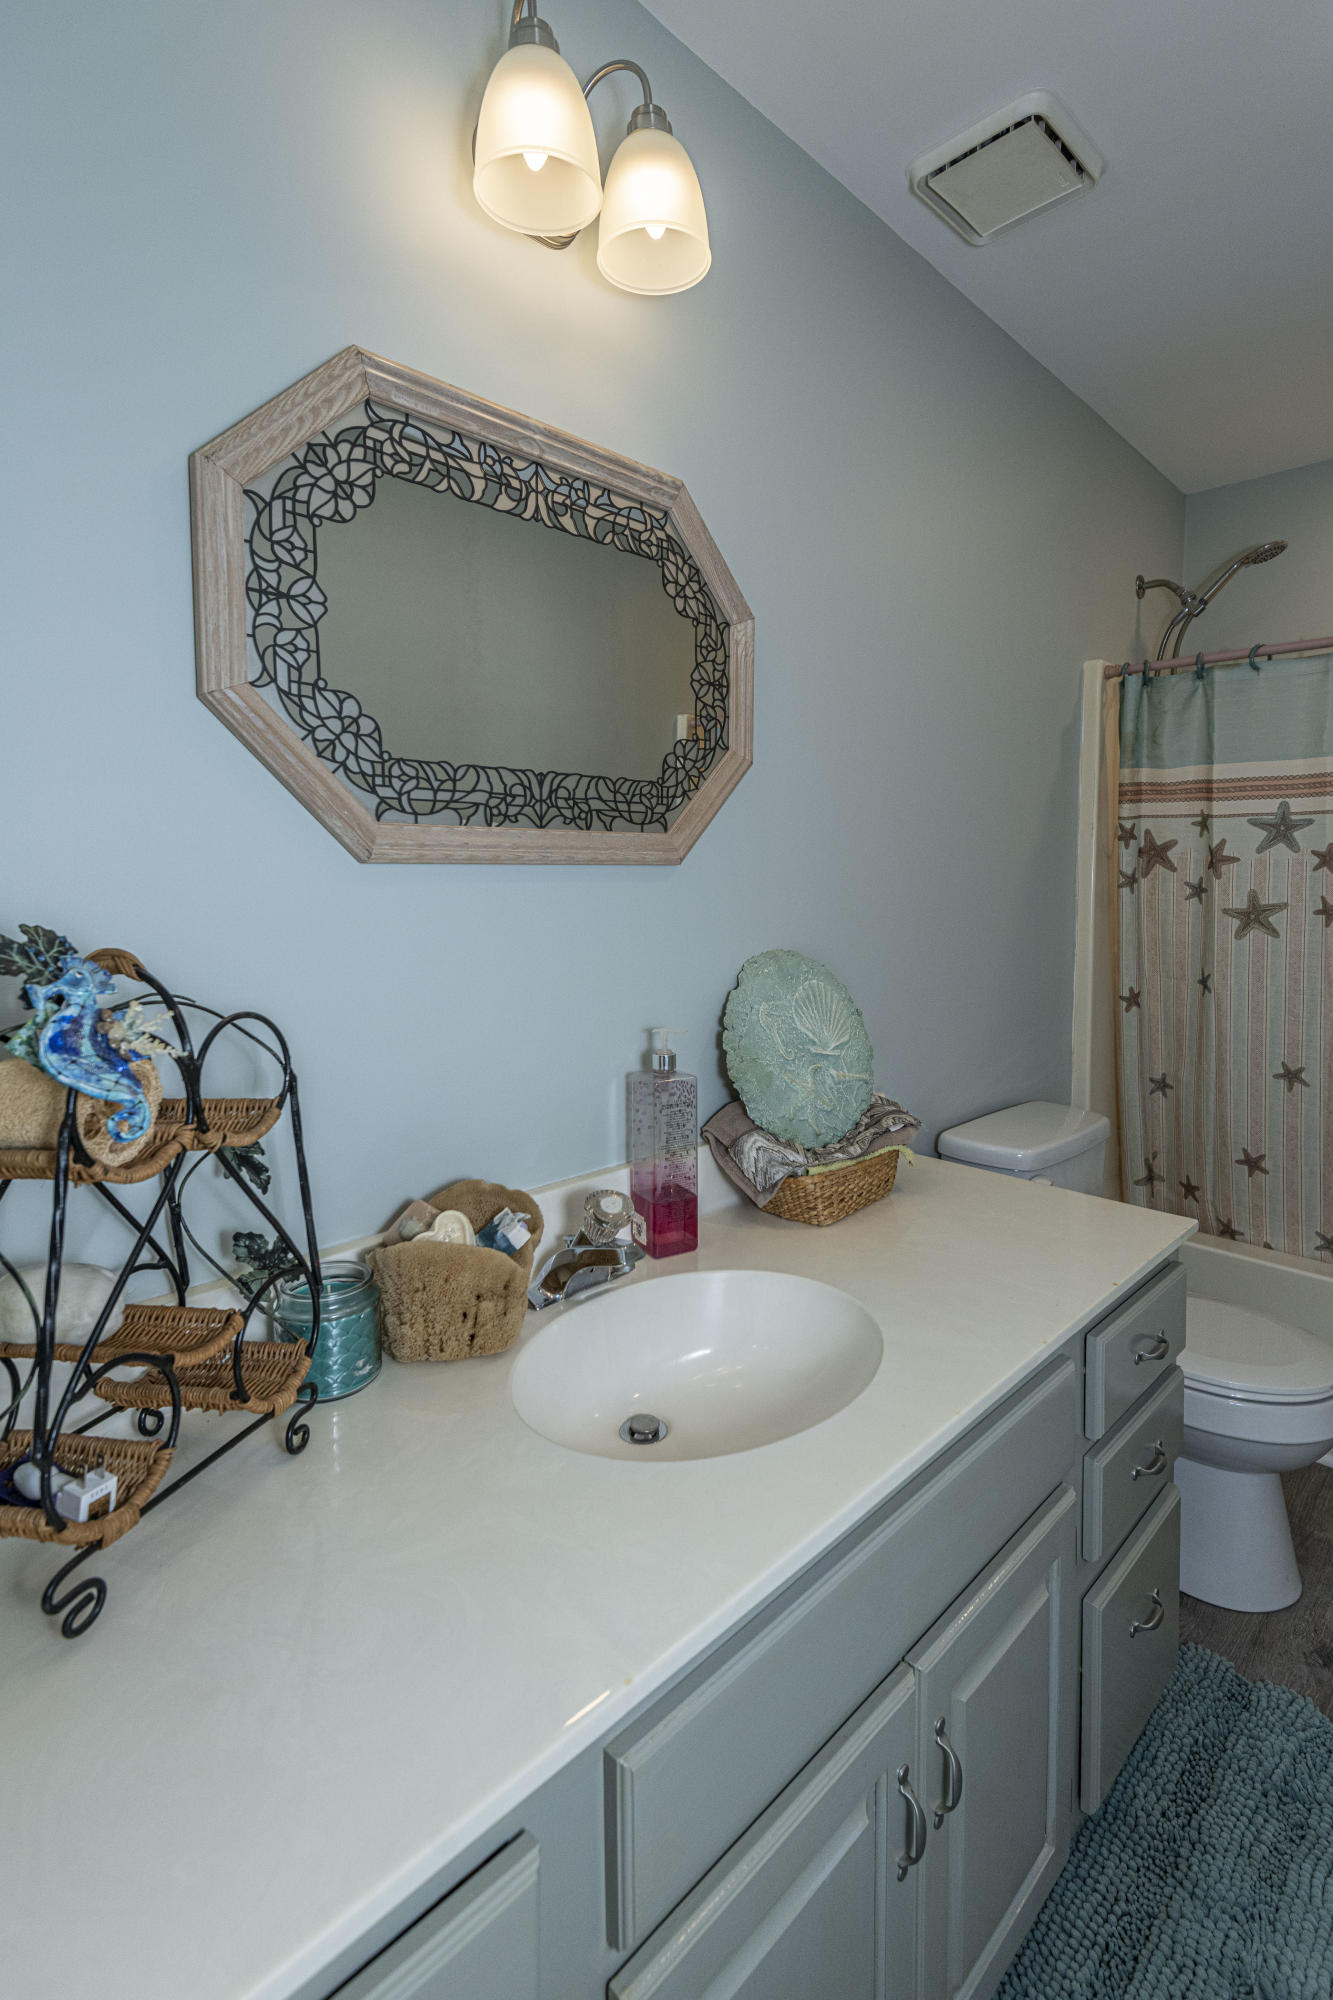 Dunes West Homes For Sale - 3215 Rose Walk, Mount Pleasant, SC - 20